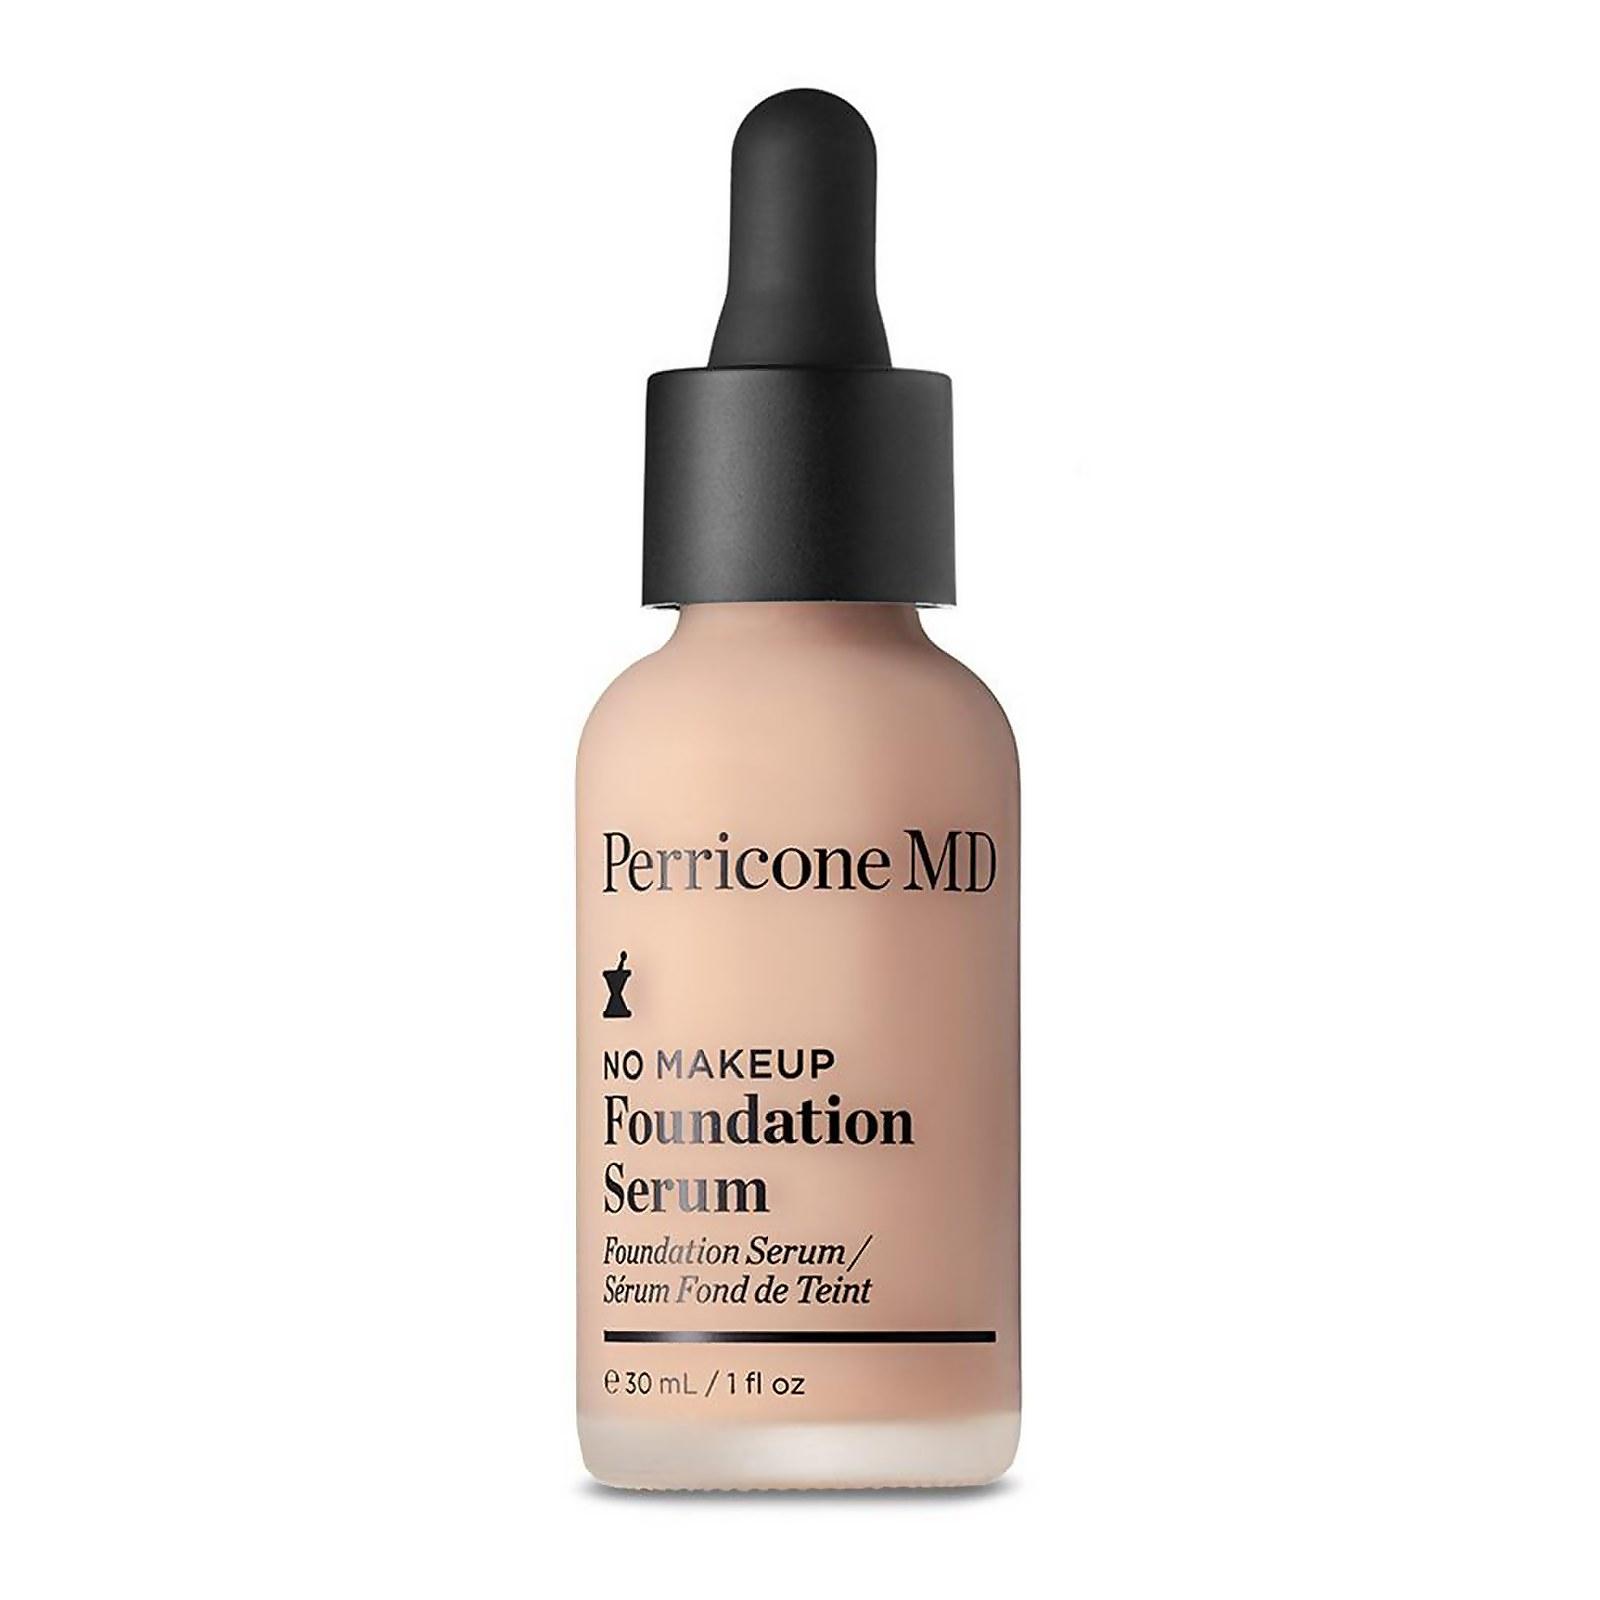 No Makeup Foundation Serum Broad Spectrum Spf 20 Perricone Md